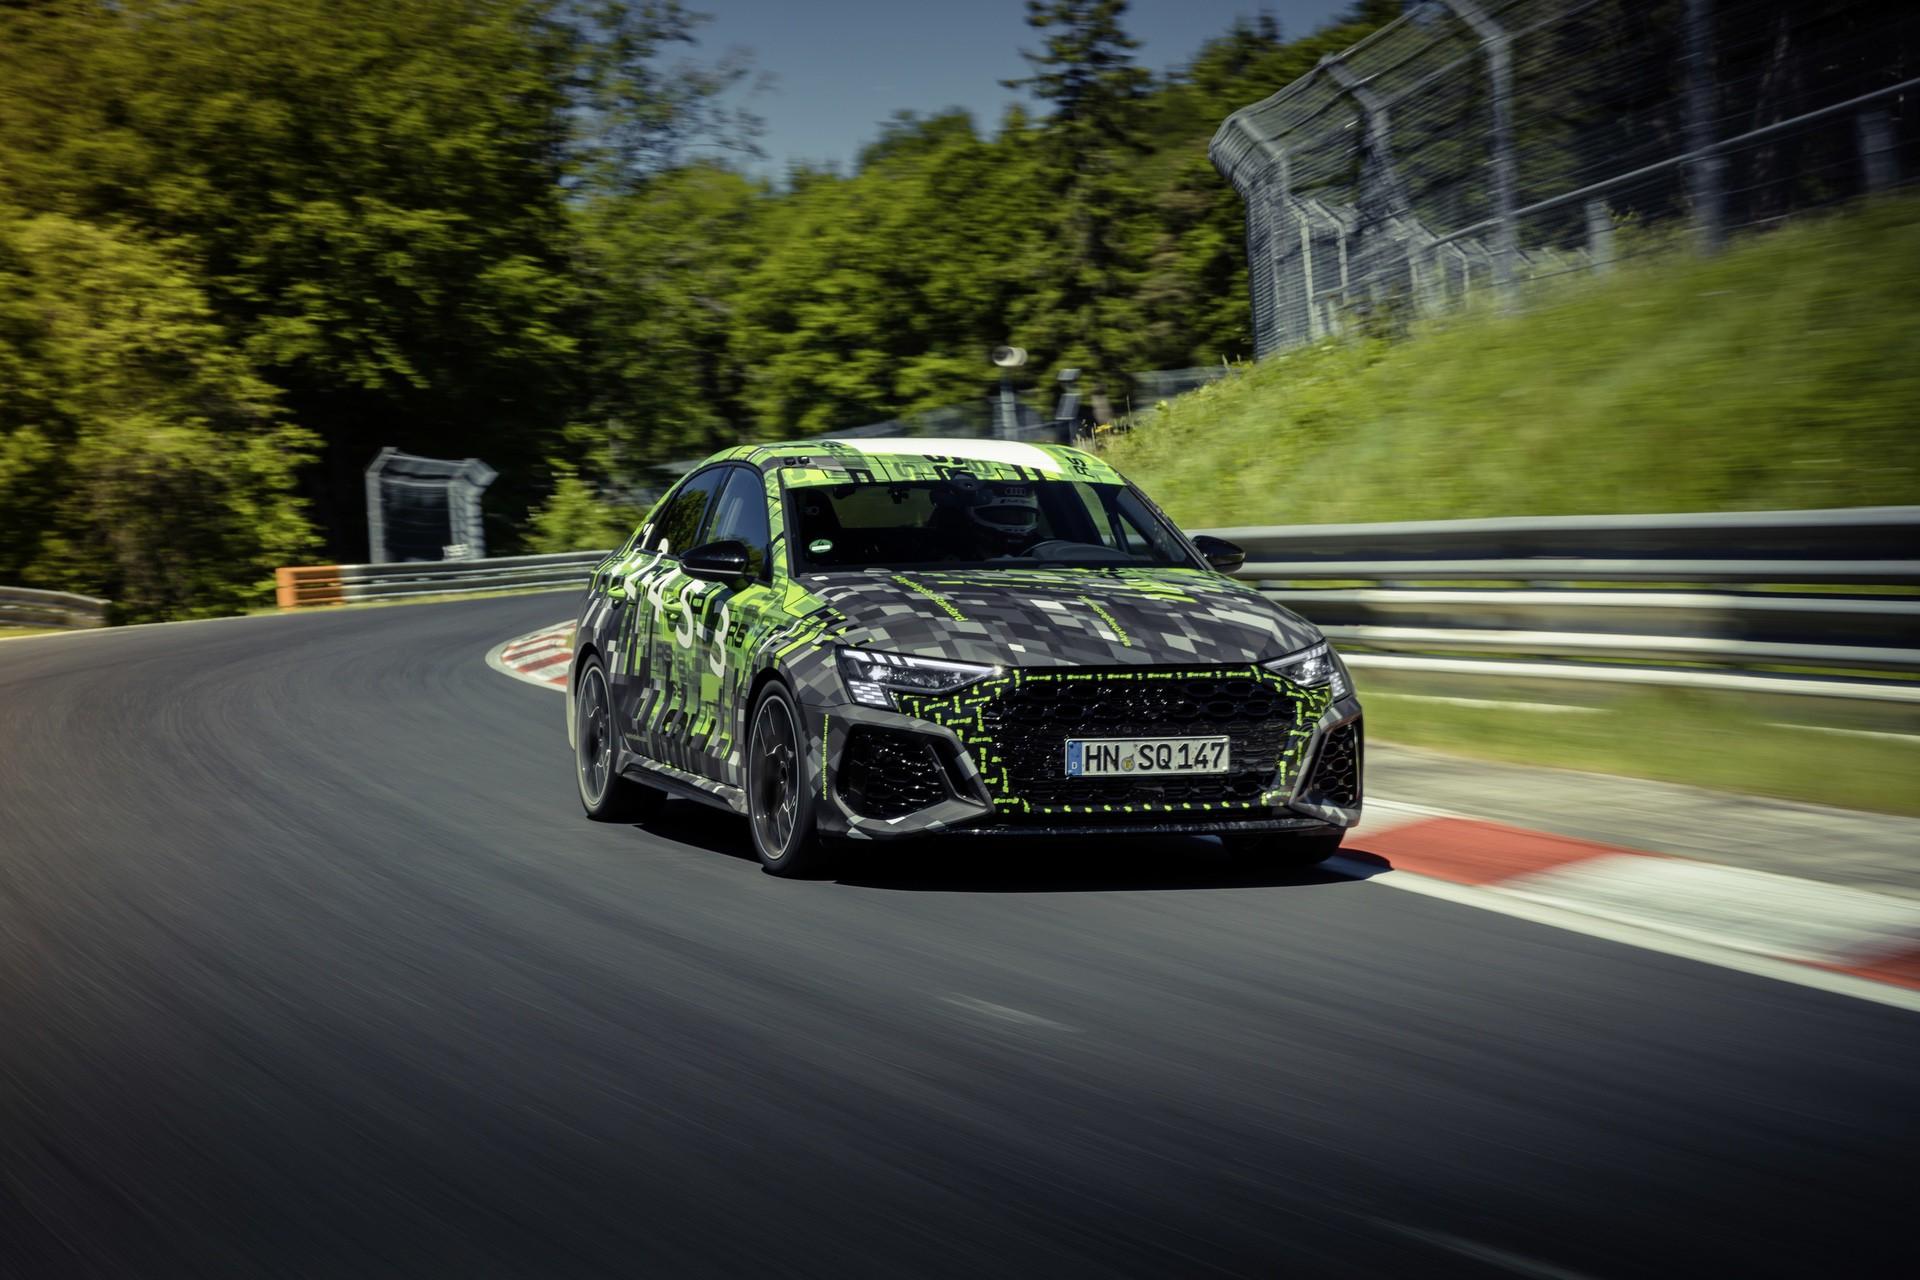 Audi_RS3_Sedan_Nurburgring_lap_record-0017